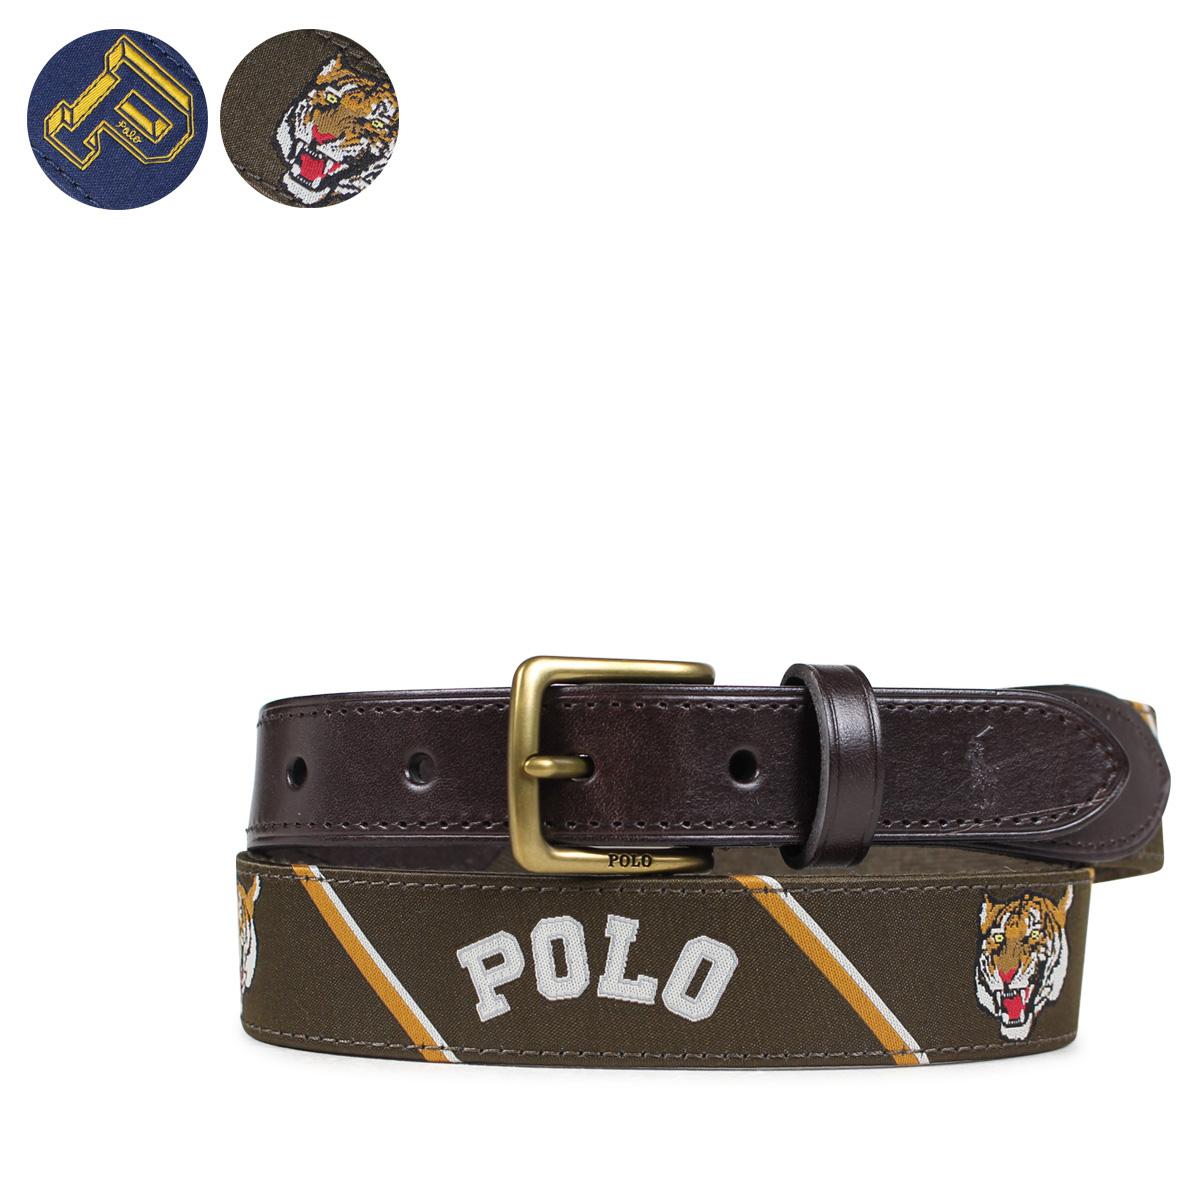 3534cc135a466 POLO RALPH LAUREN 405666043 polo Ralph Lauren belt men leather belt casual  navy olive  7 12 Shinnyu load